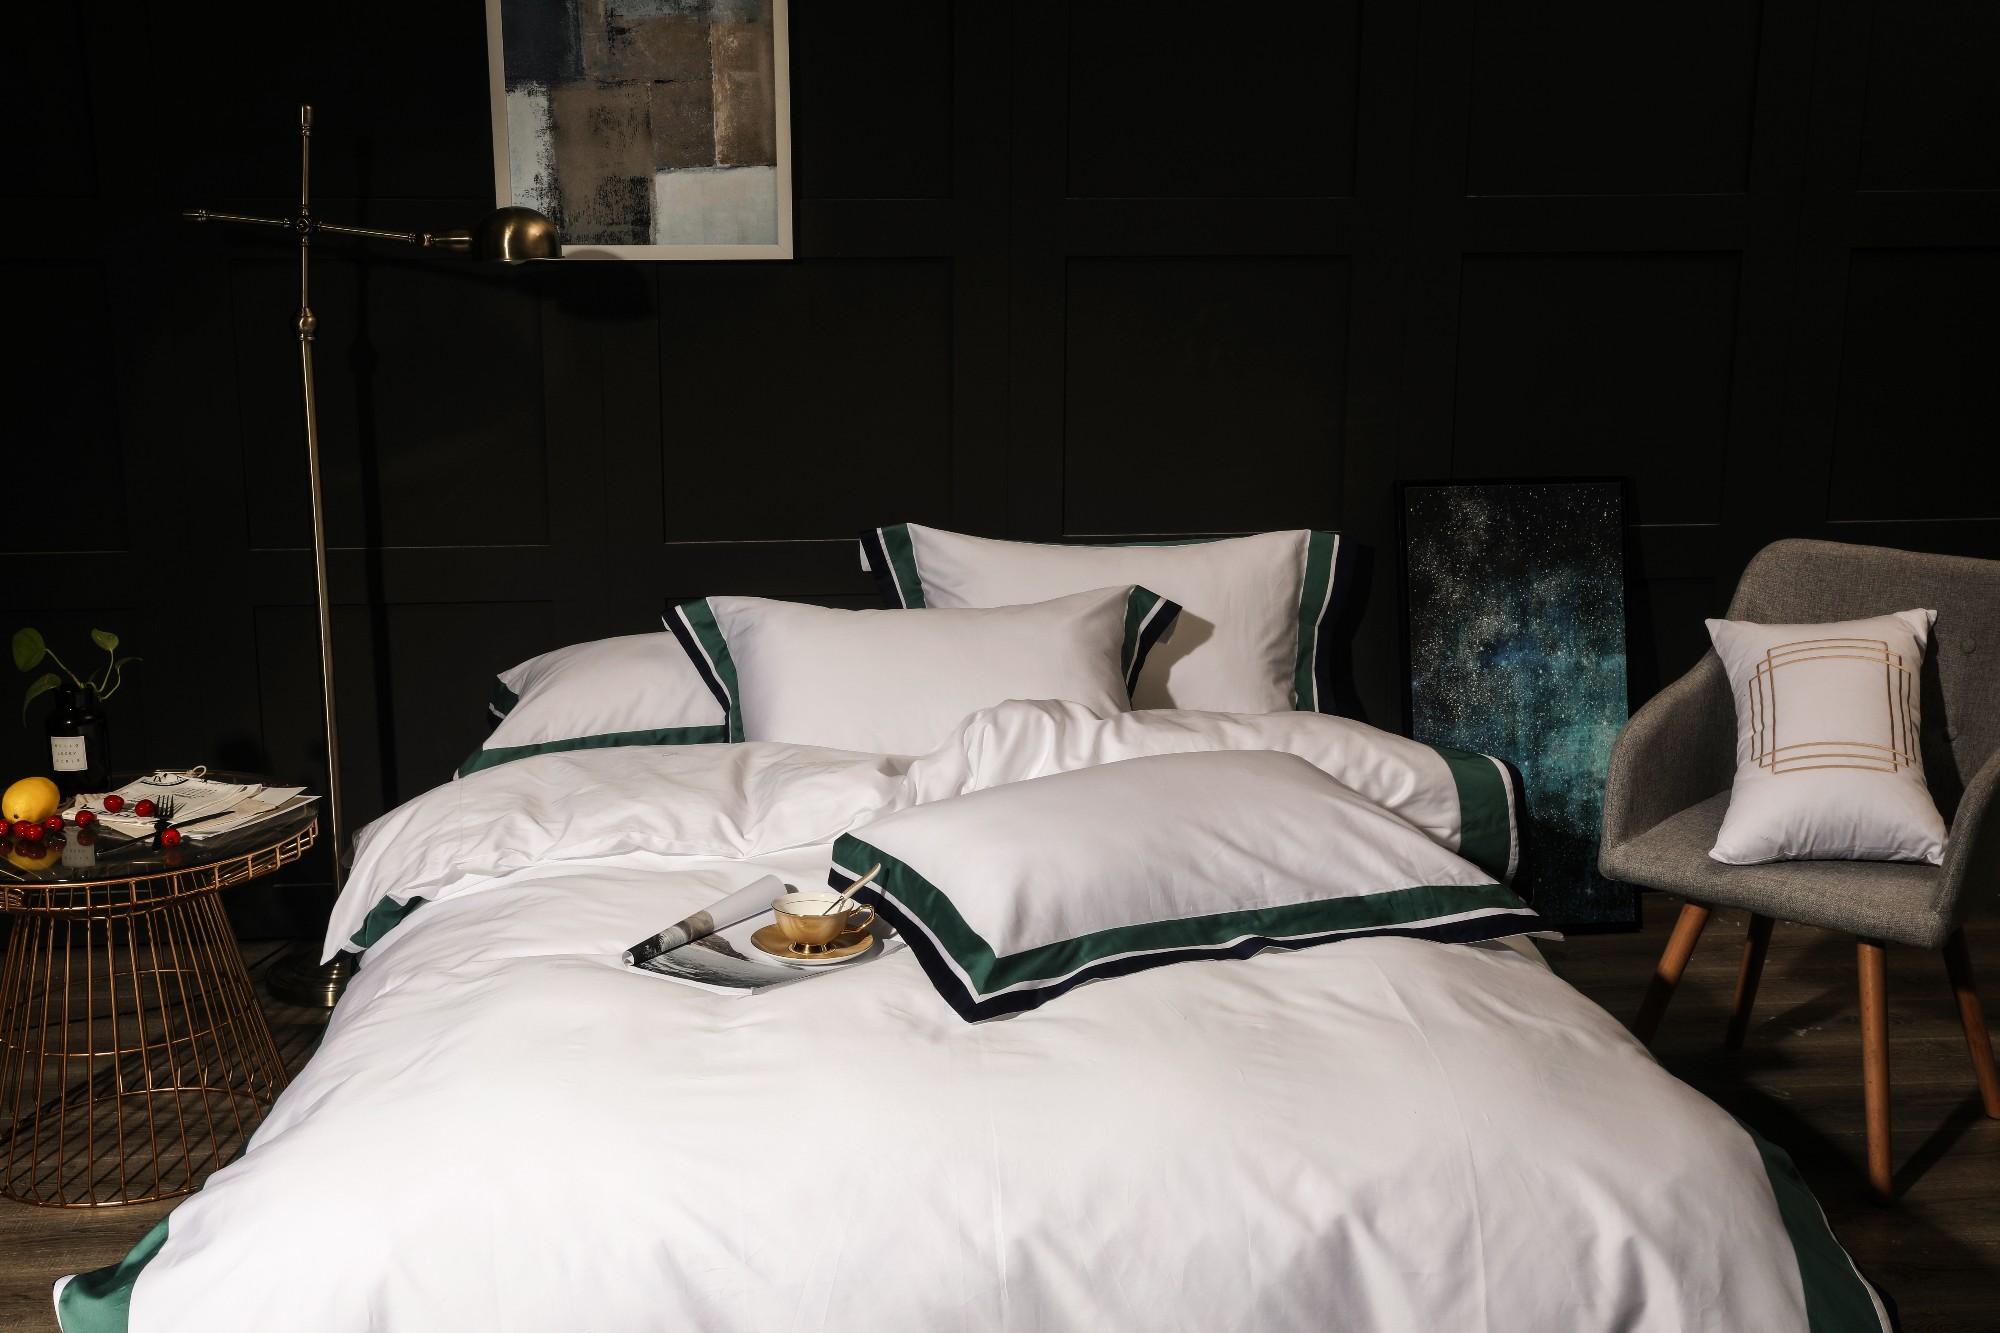 Cotton Bed Sheets Set Manufacturers, Cotton Bed Sheets Set Factory, Supply Cotton Bed Sheets Set